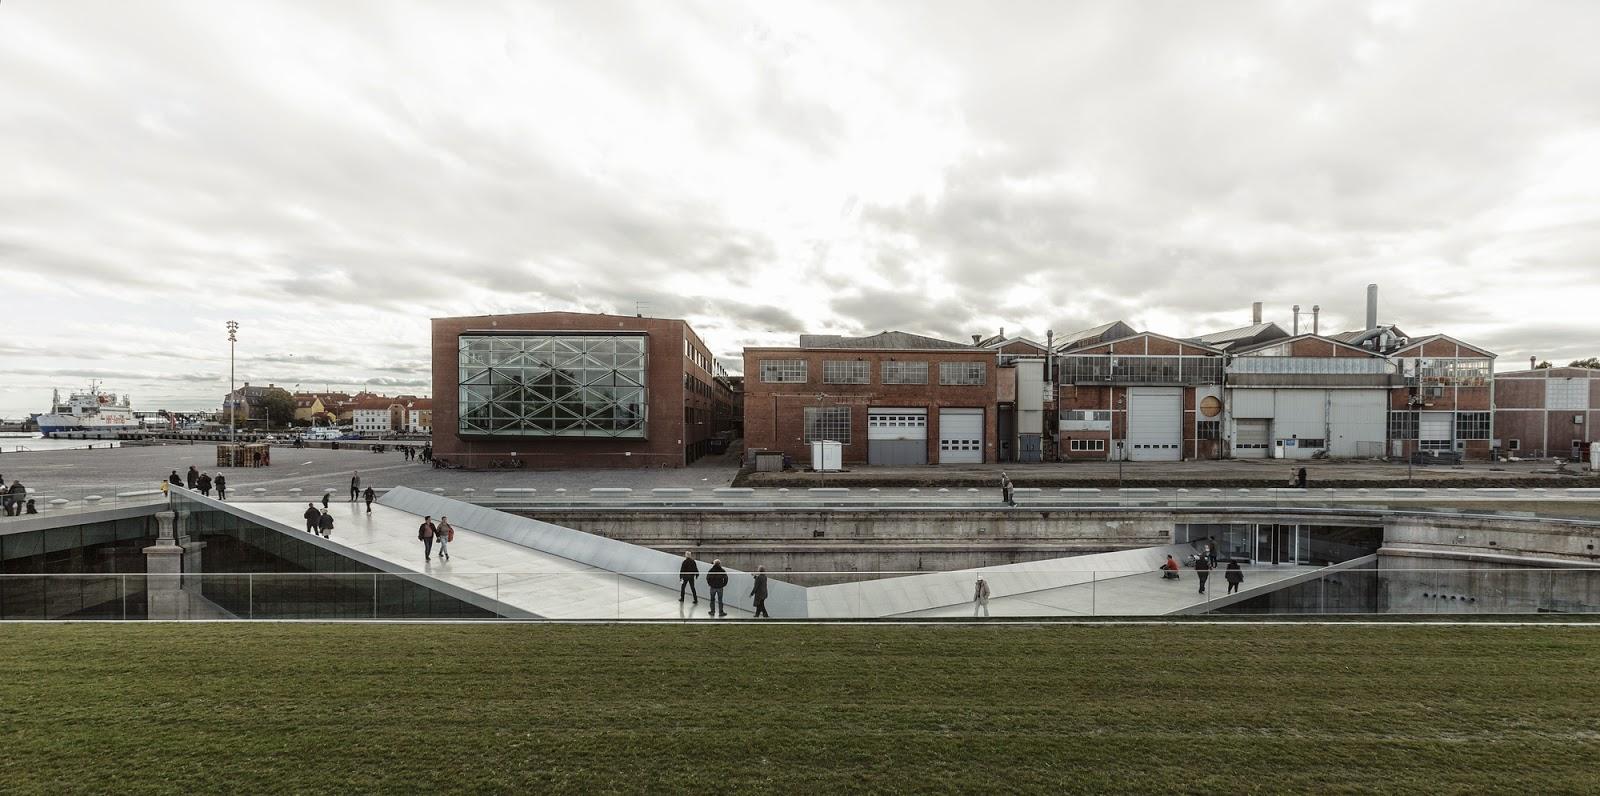 Architecture as aesthetics danish national maritime museum for Architektur rampe